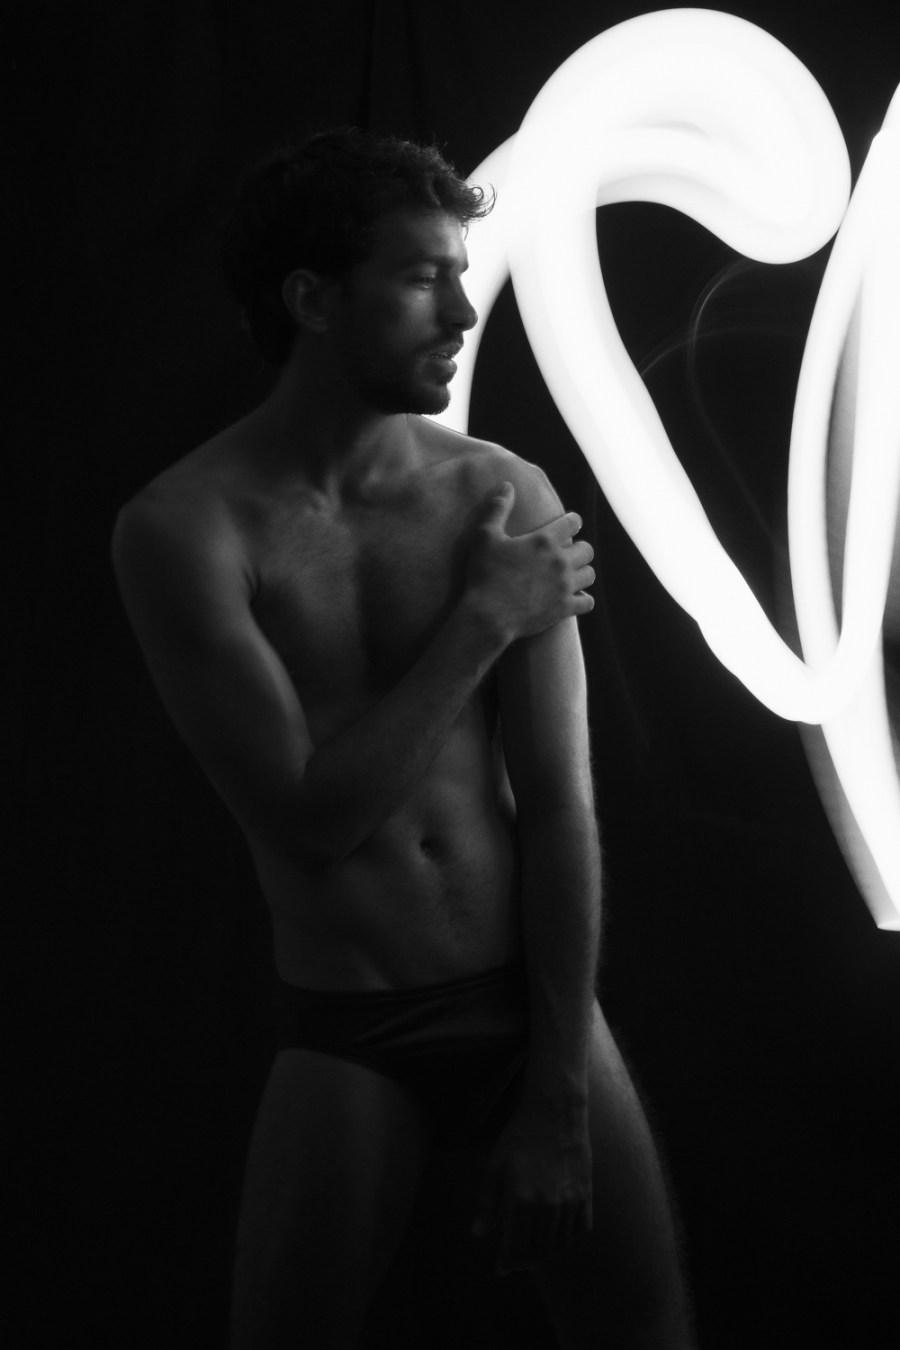 Brazilian model and surfer André Albuquerque is posing for the lens of photographer René de la Cruz for nº21 spreading natural beauty that André possess.